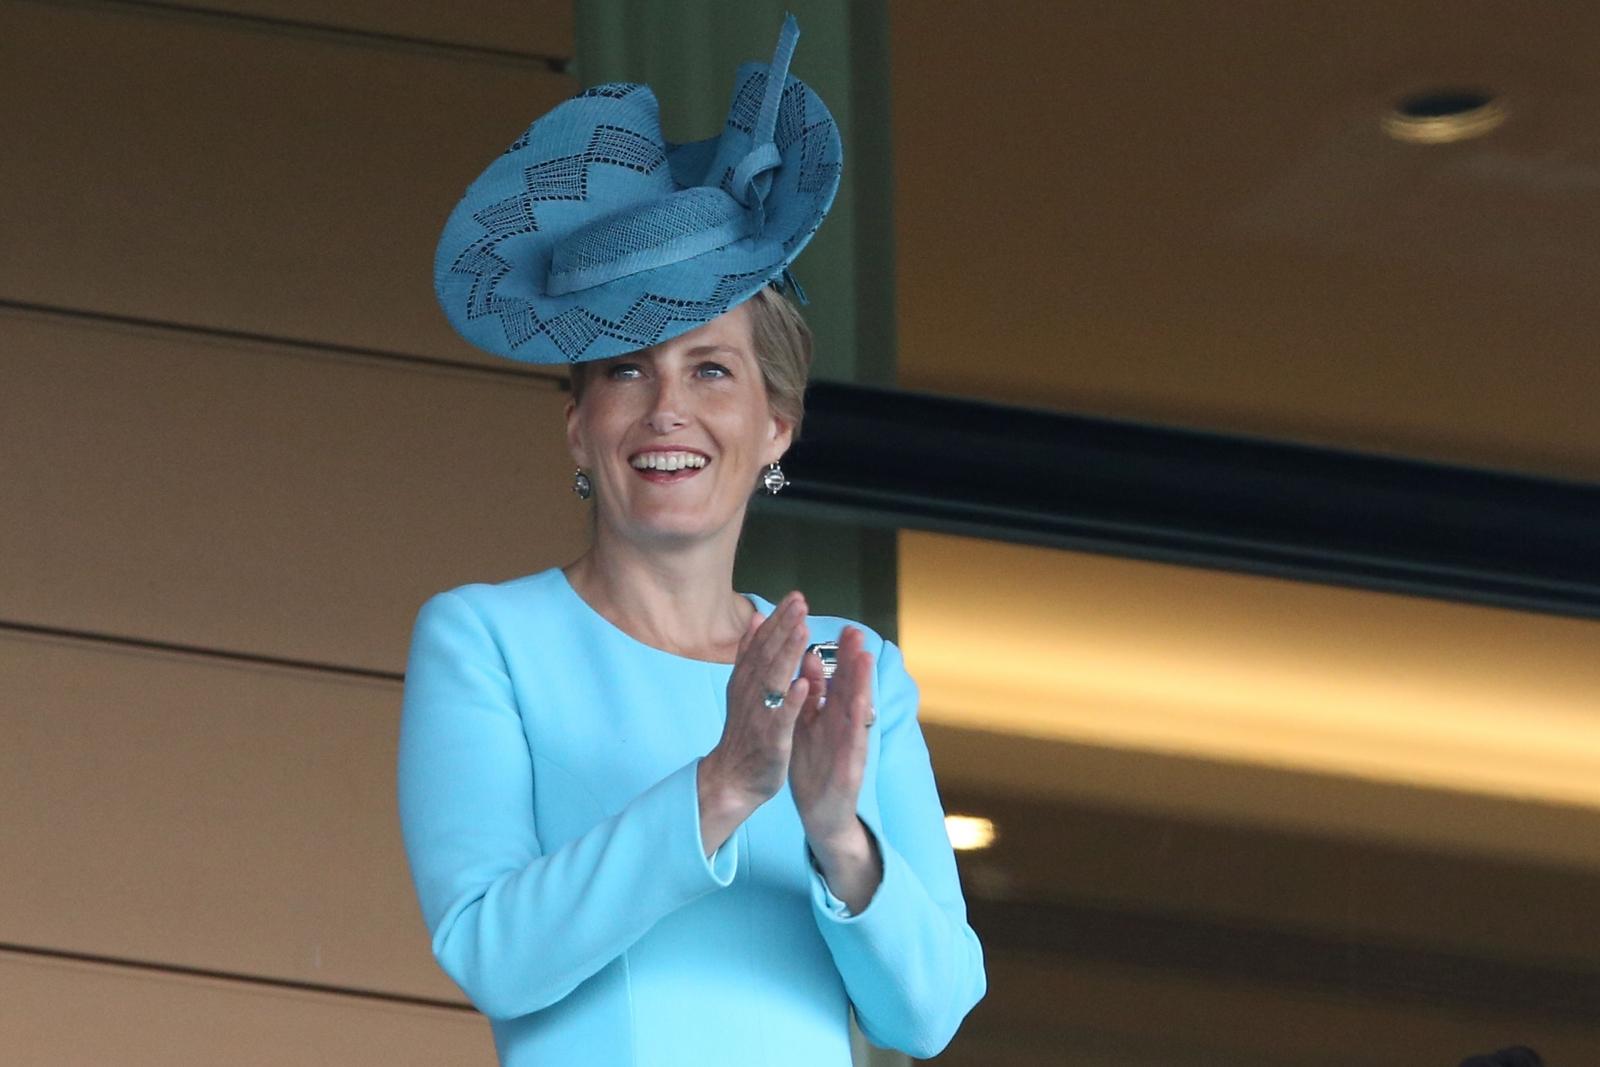 Royal Ascot best dressed